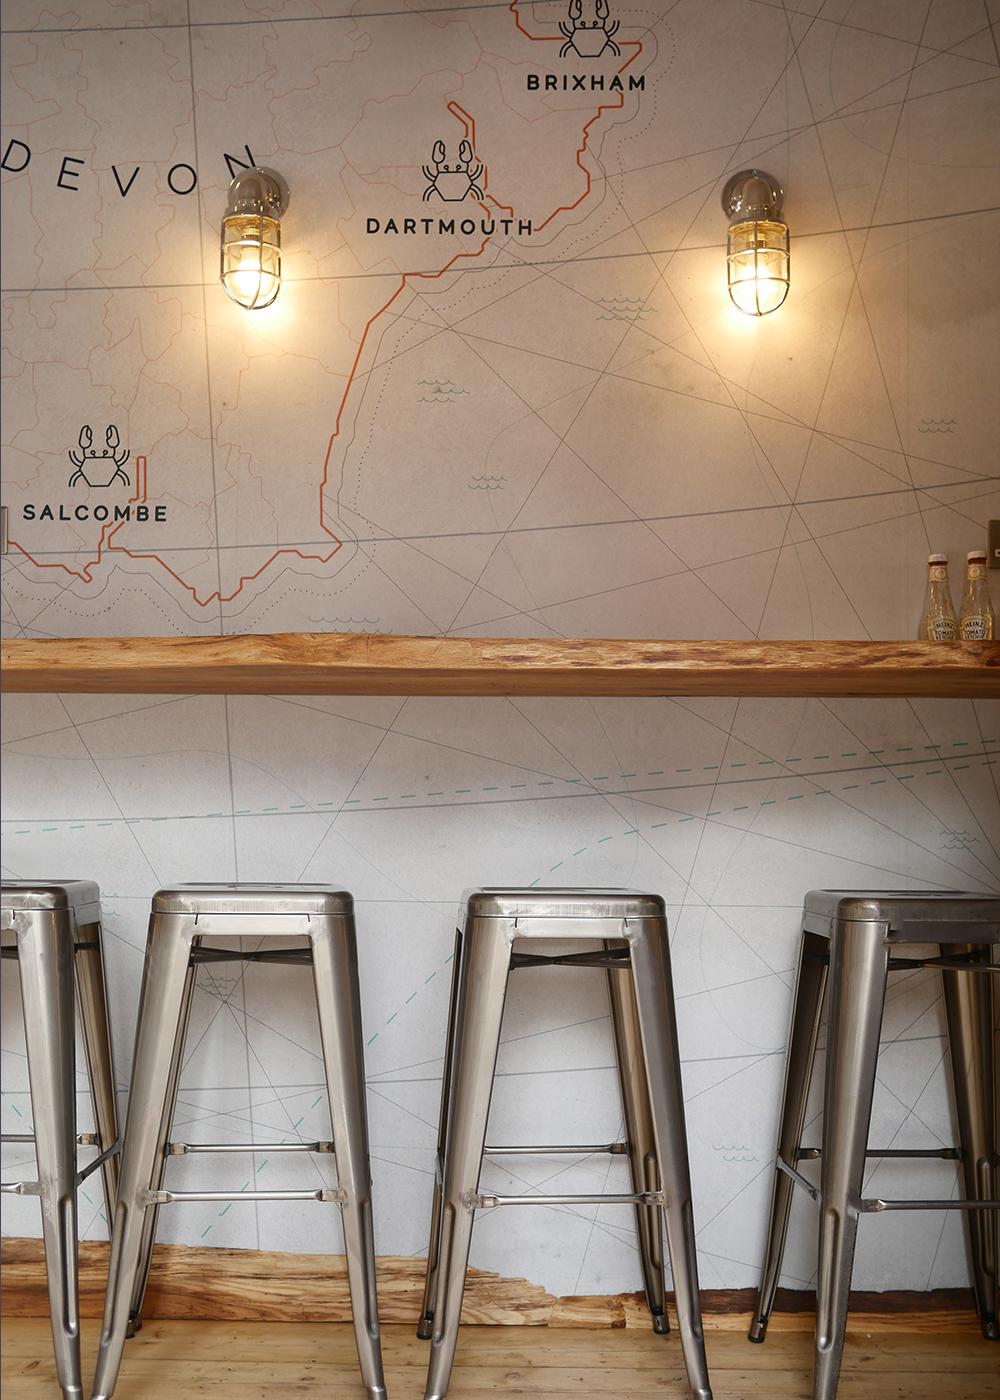 Claw-seafood-branding-wallpaper-design-runforthehills-cool-london-graphics-interior